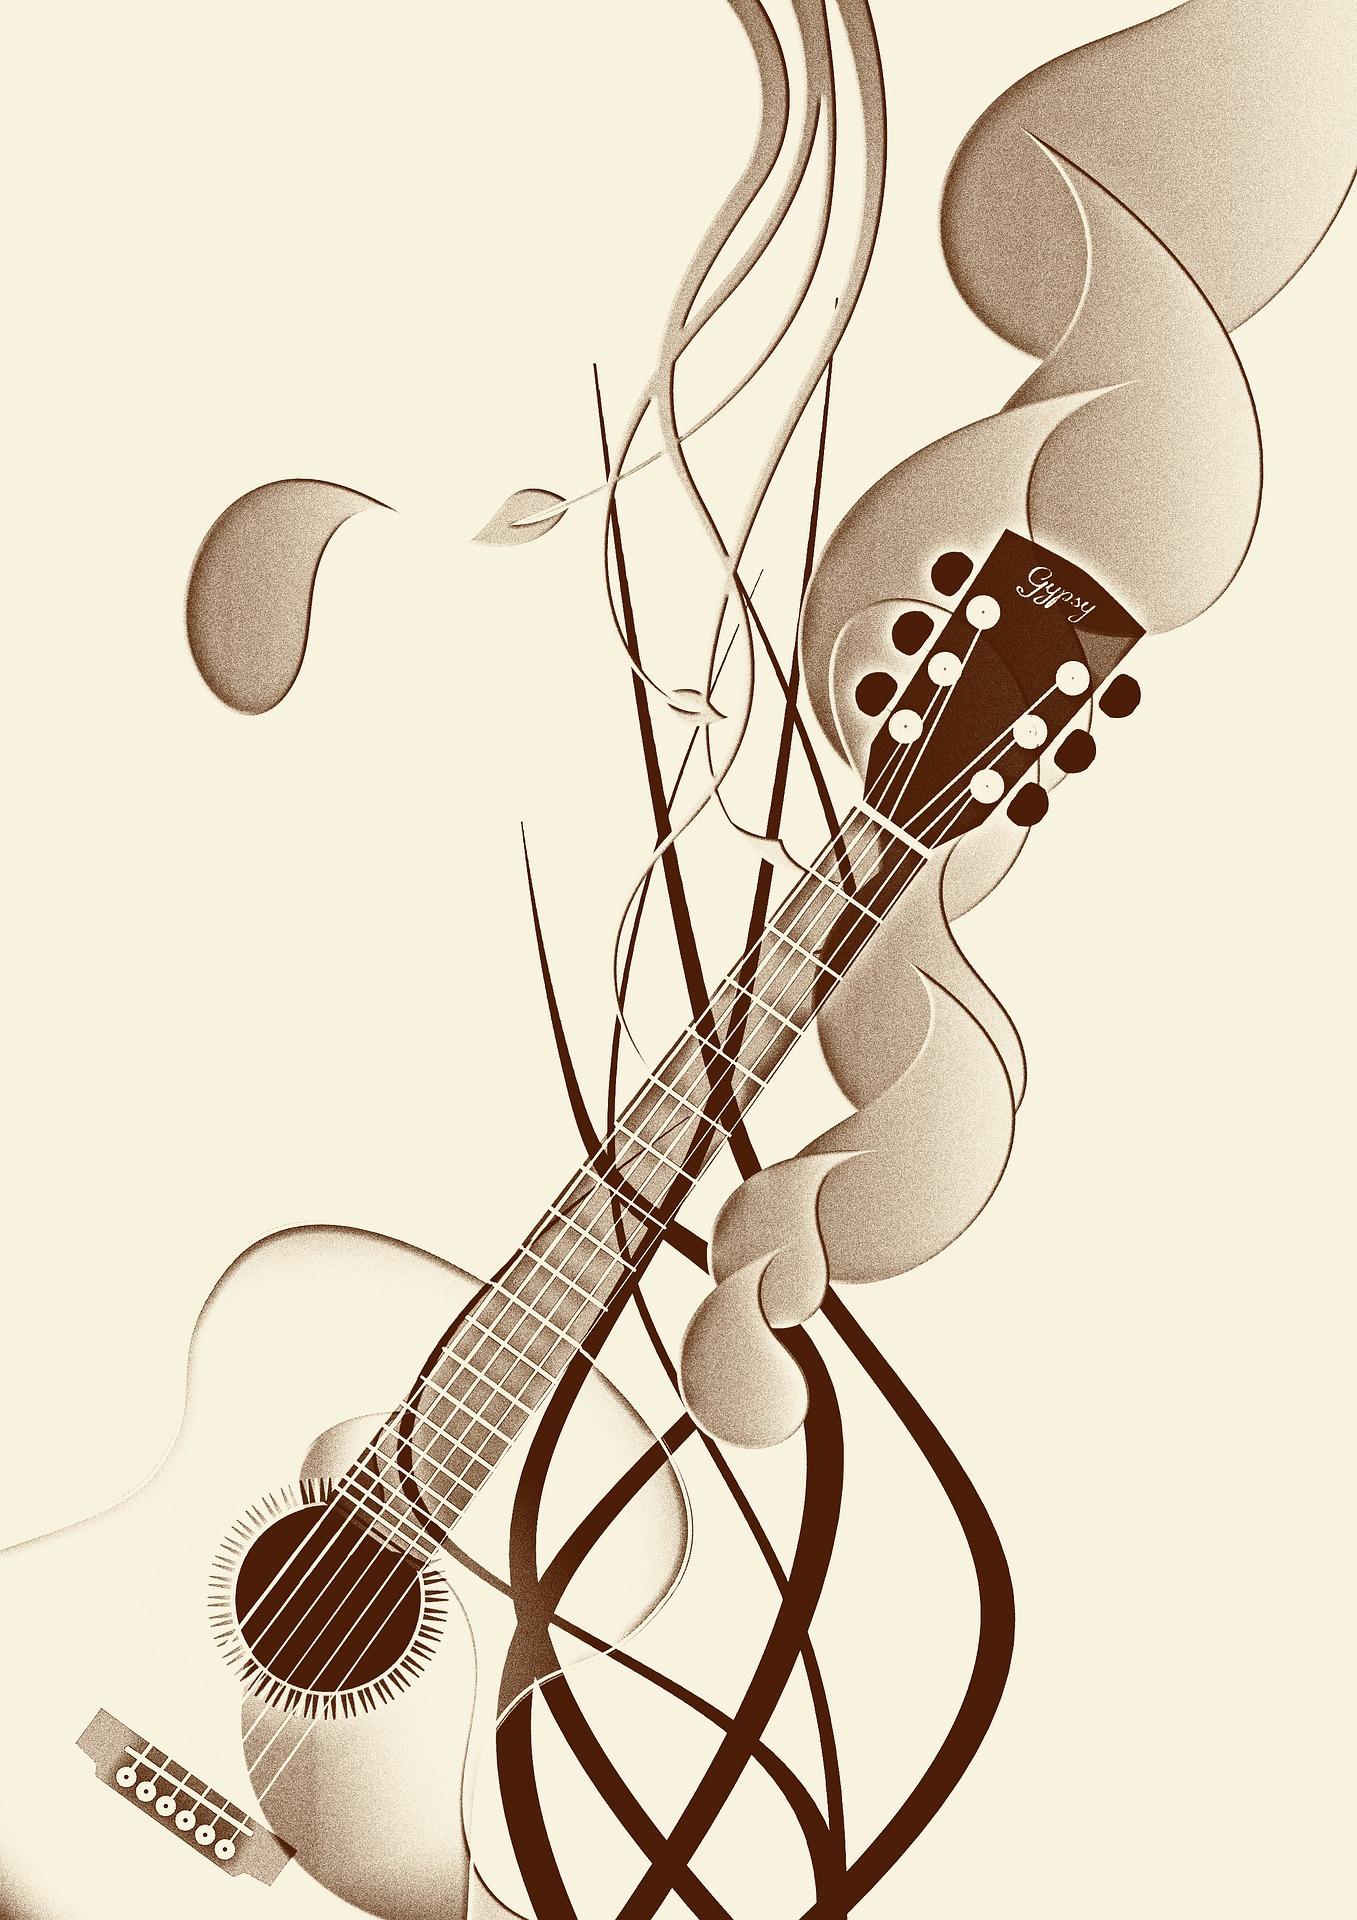 guitar-193969_1920.jpg